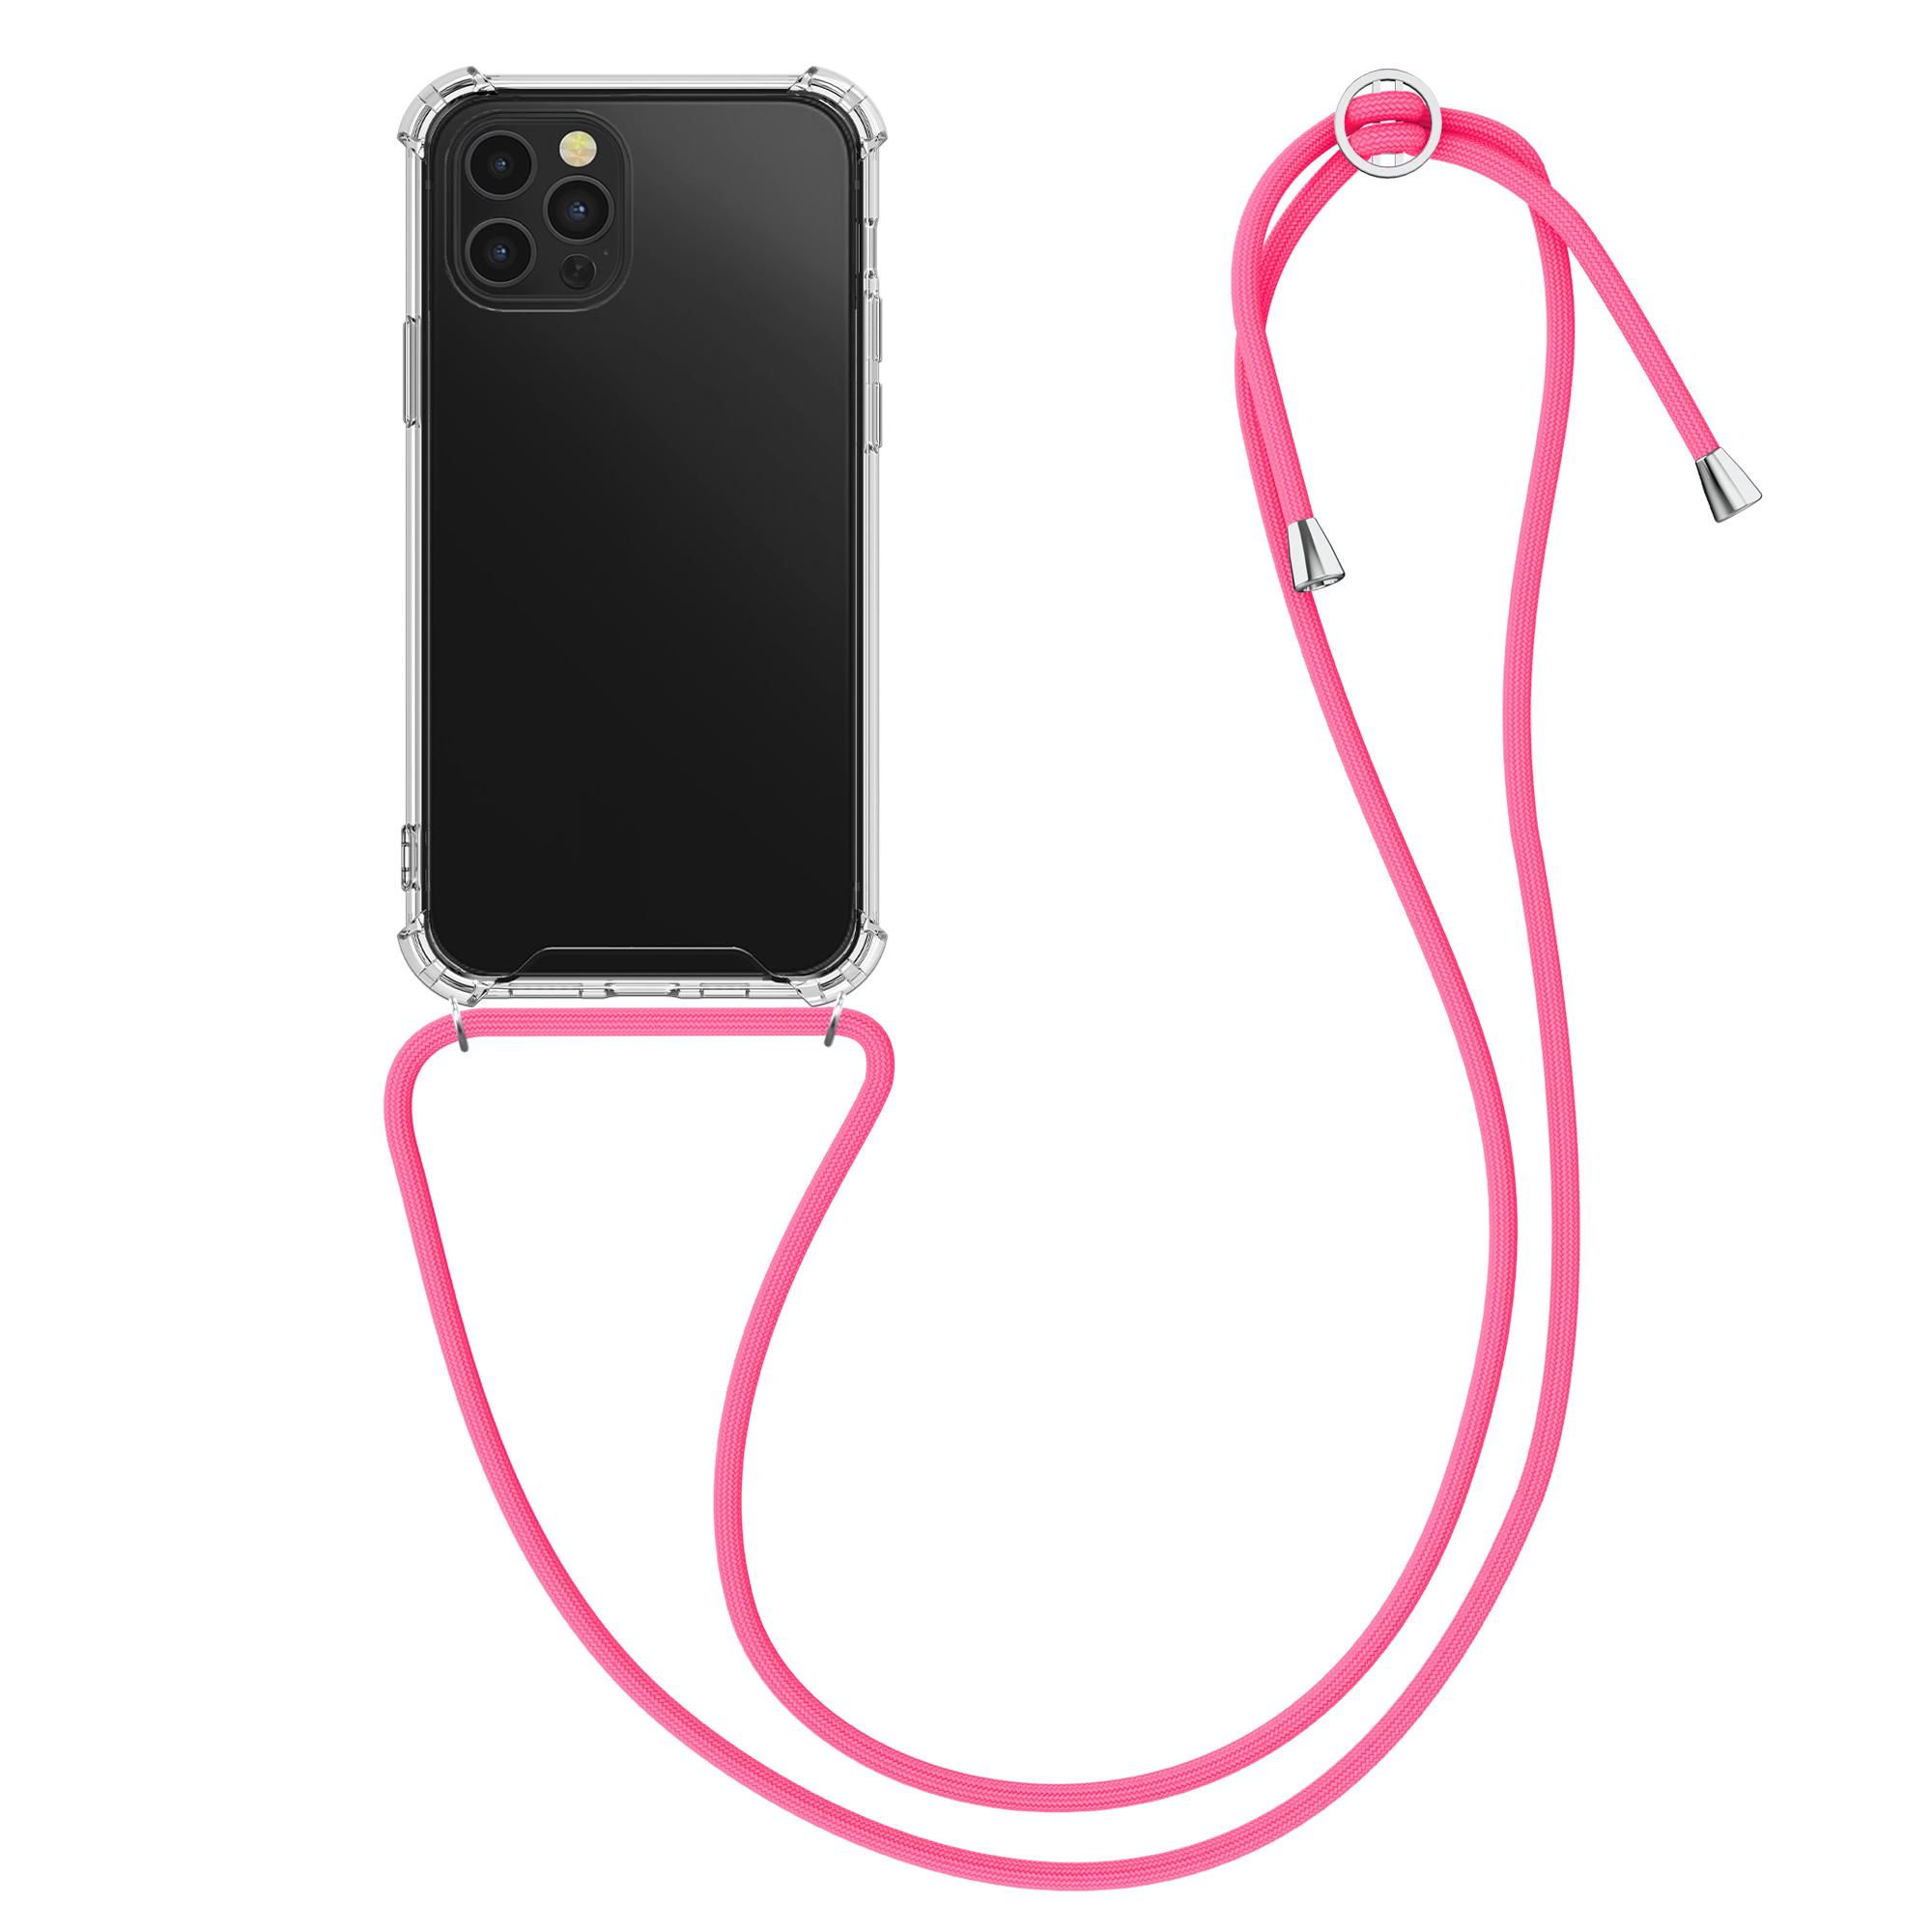 Kvalitní silikonové TPU pouzdro pro Apple iPhone 12 Pro Max - Transparent | Neon Pink